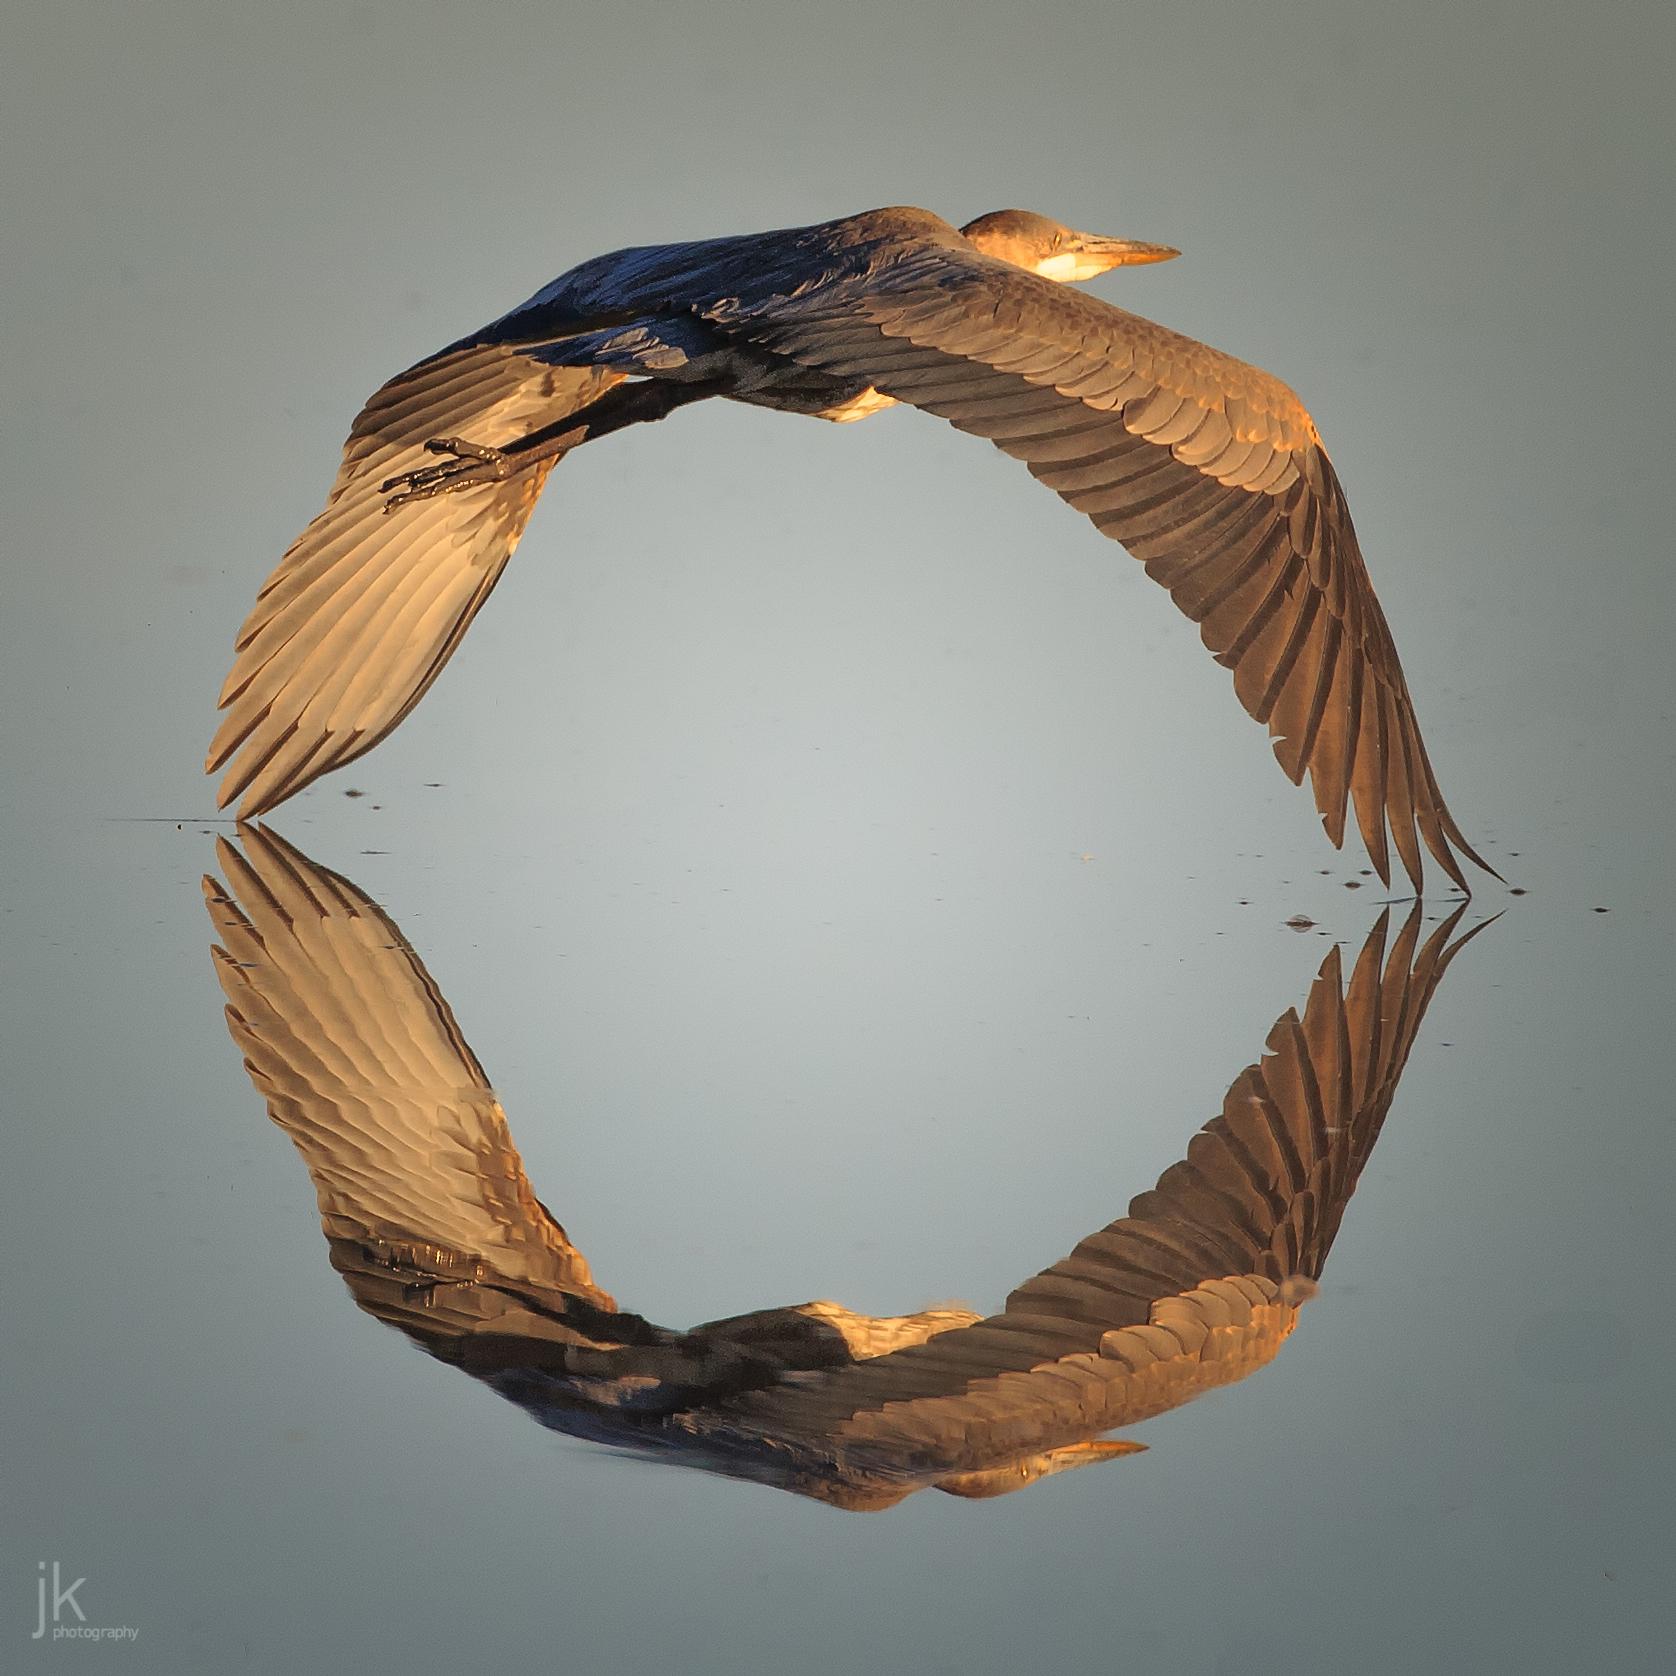 20180410-birds=jkp-9.jpg